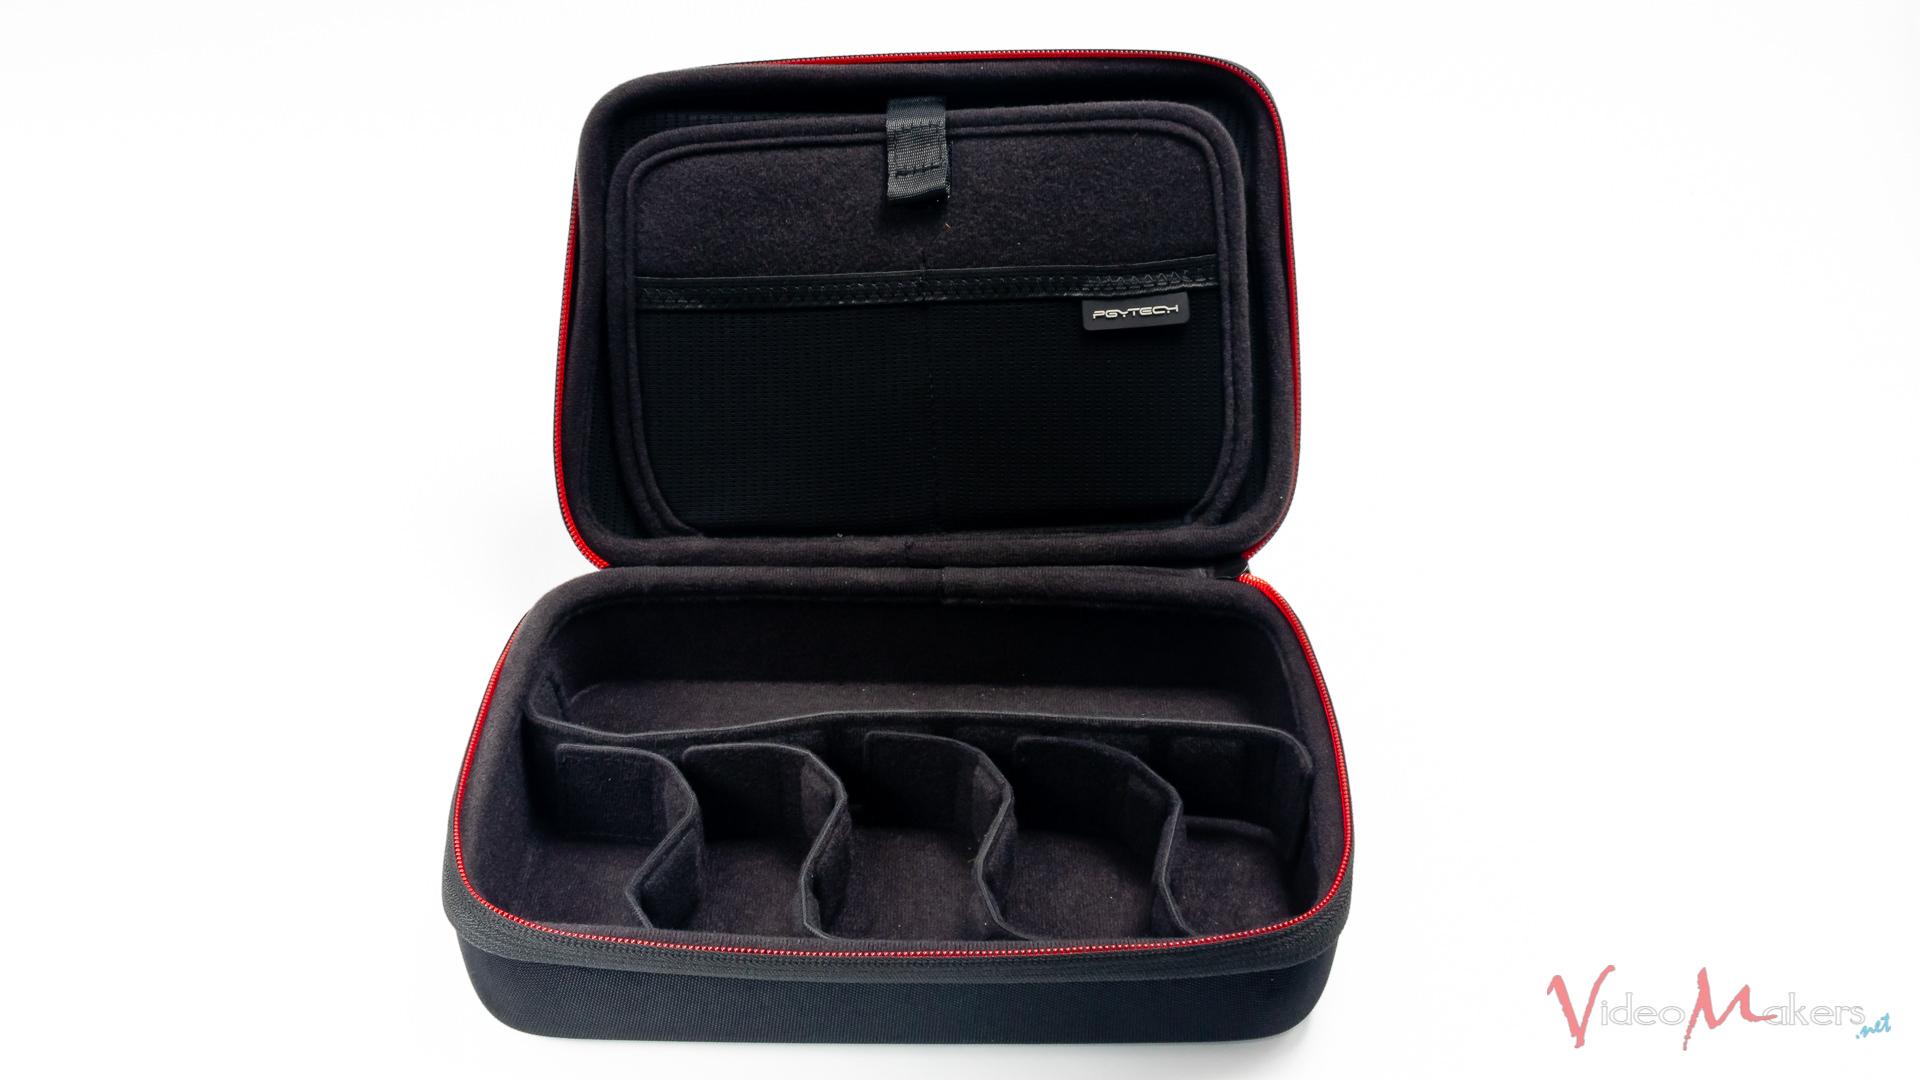 PGYTech Carrying Case